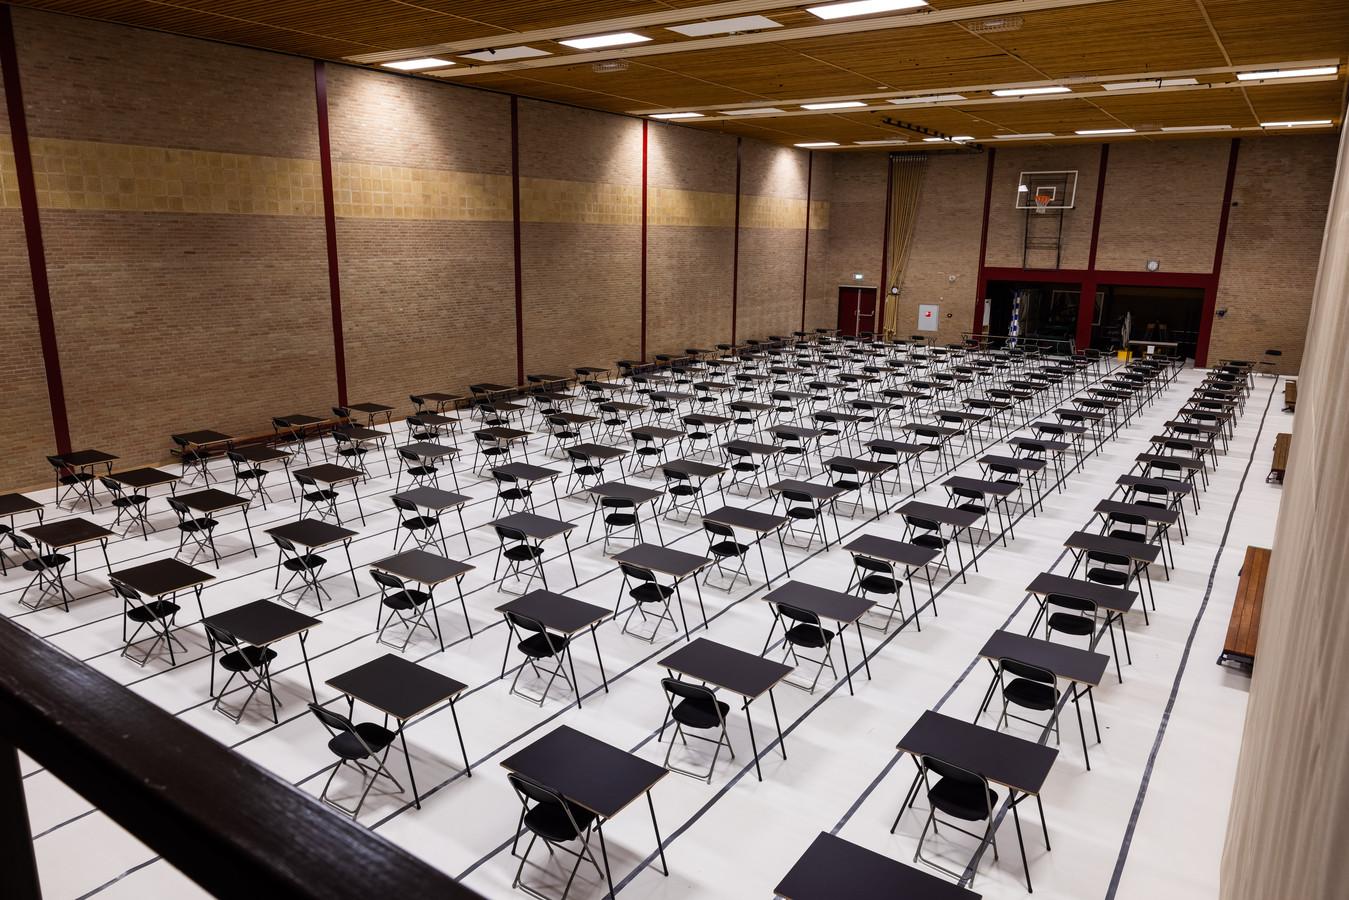 Sporthal Theereheide in Sint Michielsgestel is in gereedheid gebracht voor de eindexamens van Gymnasium Beekvliet die beginnen op maandag 17 mei.